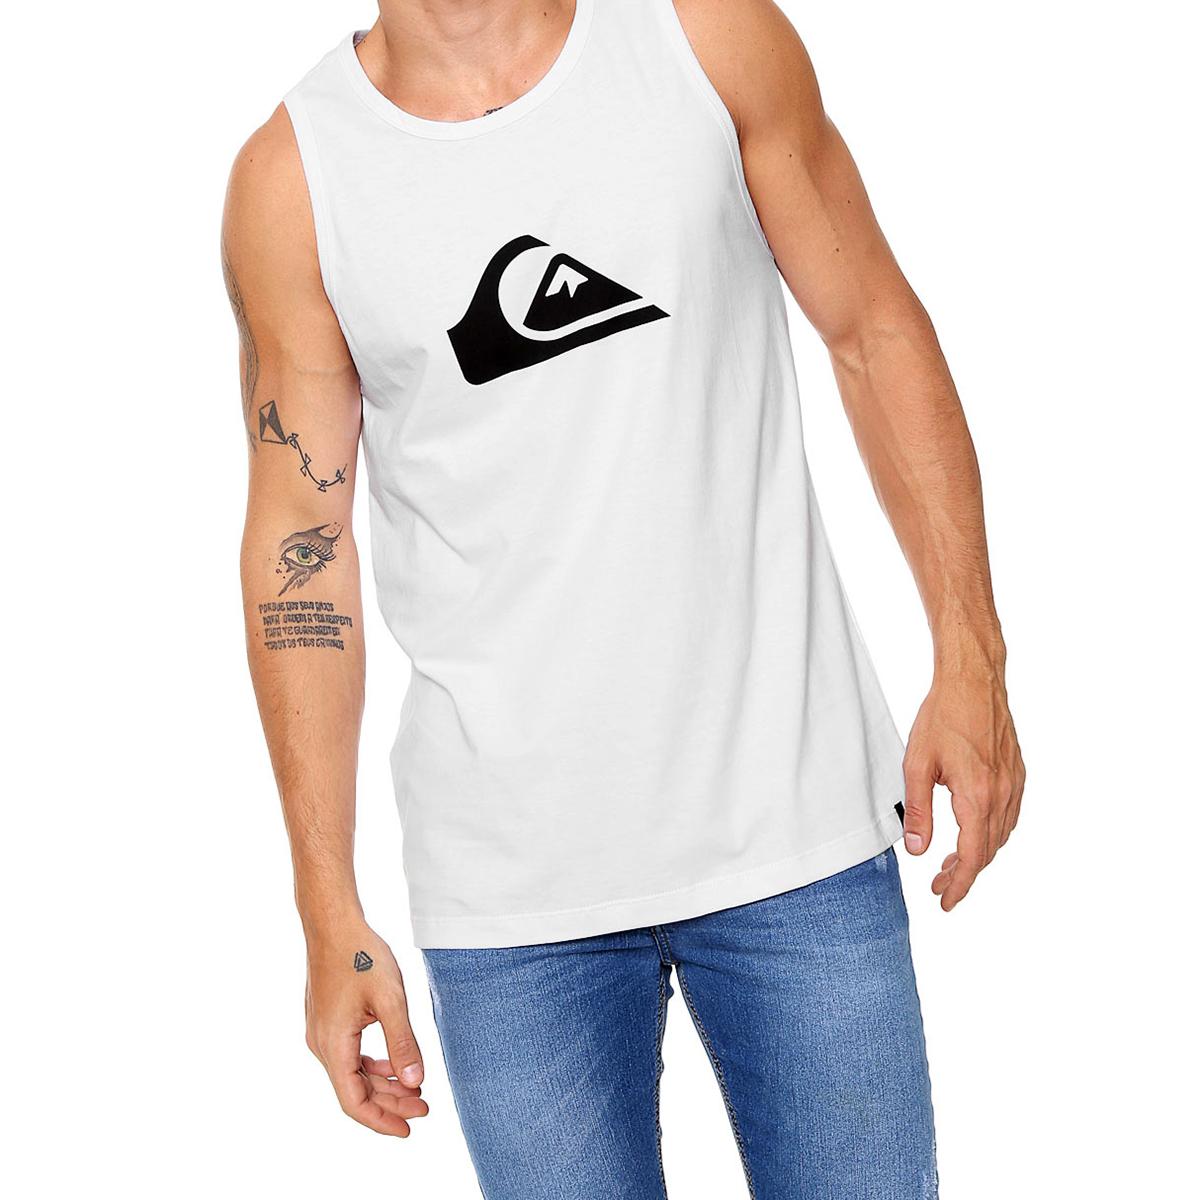 Camiseta Regata Quiksilver Básica Comp Masculina - Branca